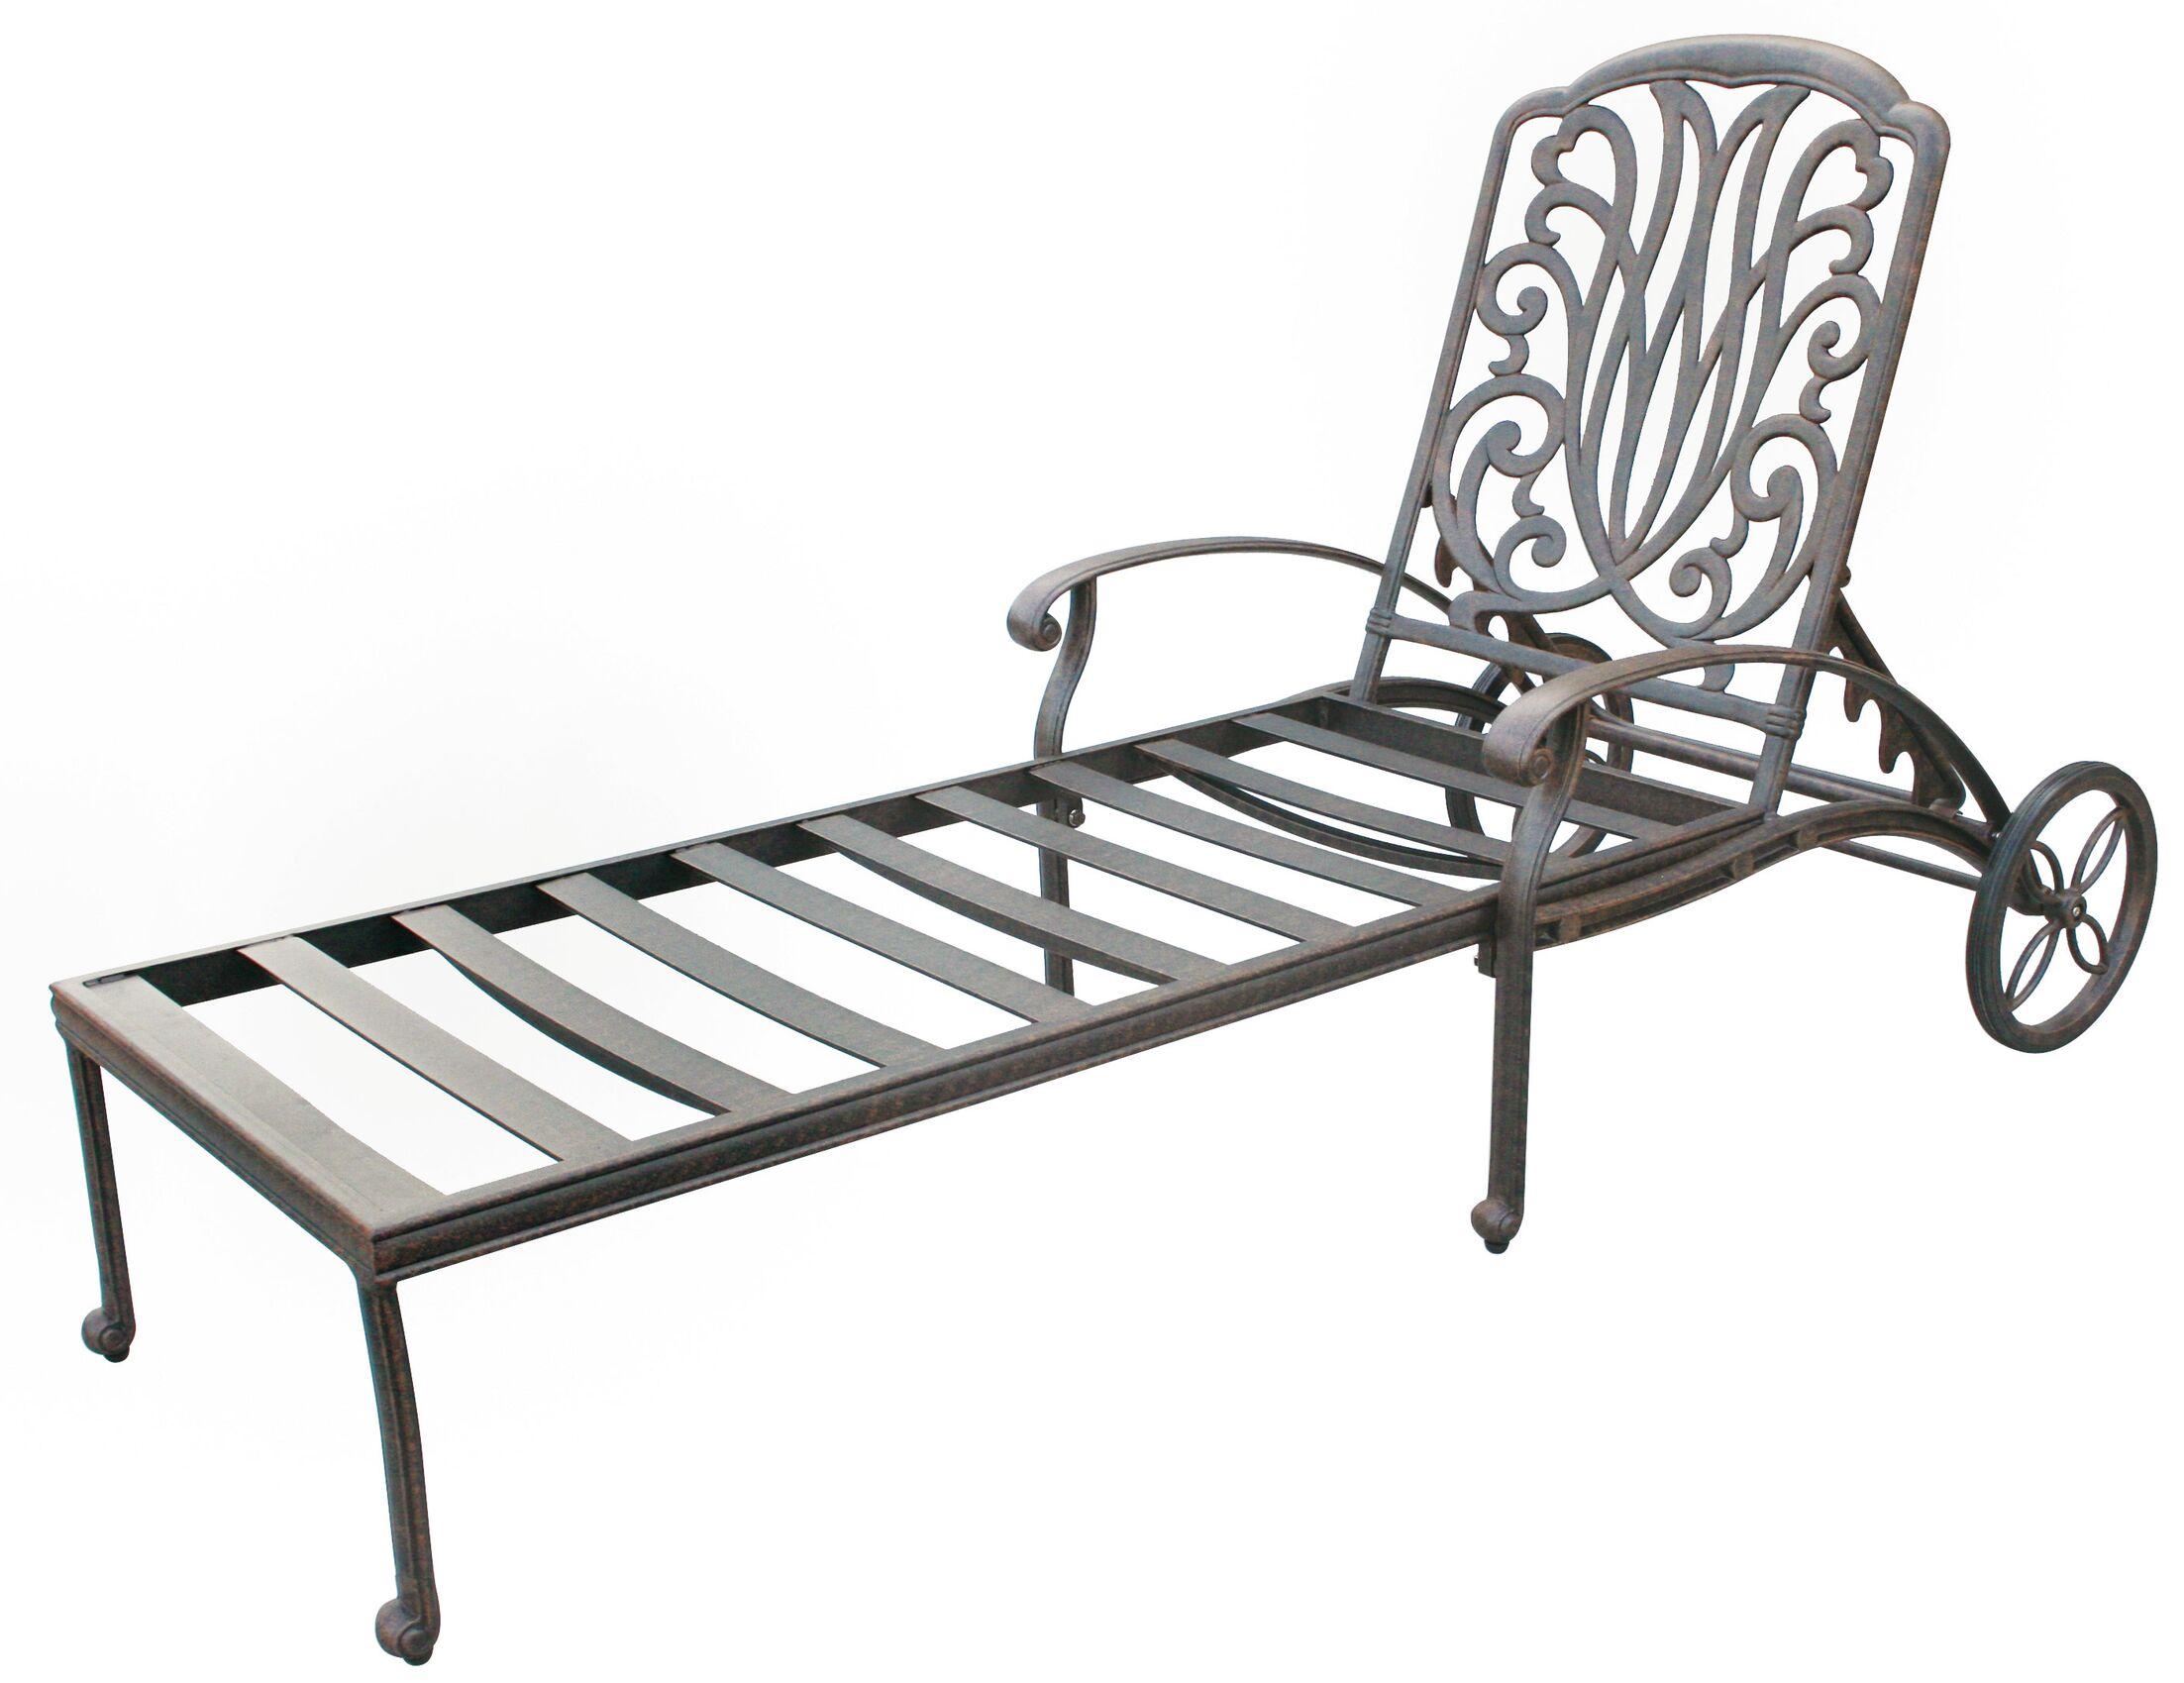 Lebanon Chaise Lounge with Cushion